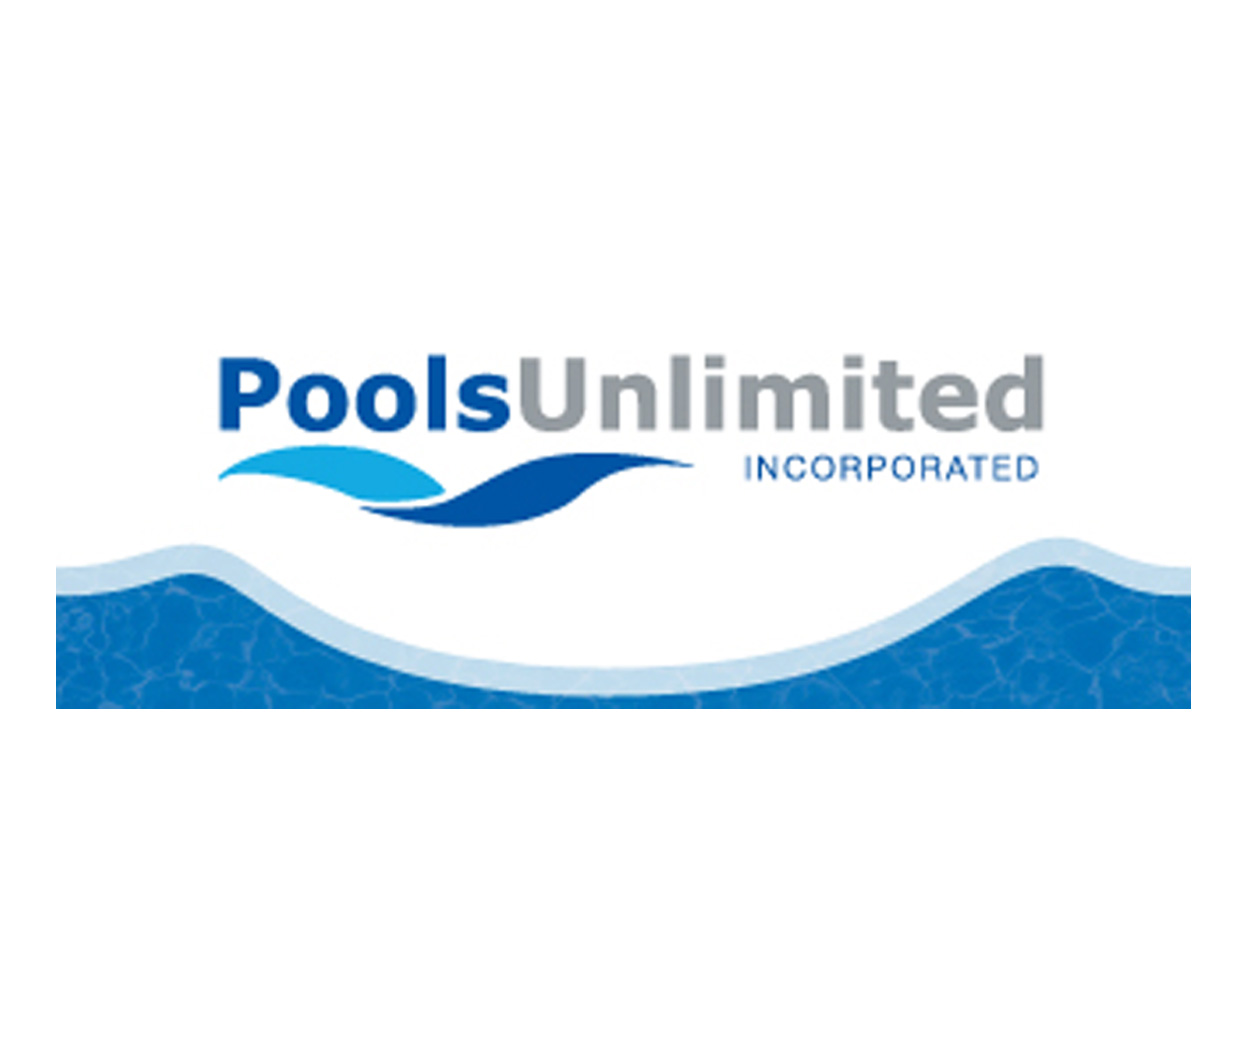 Pools Unlimited